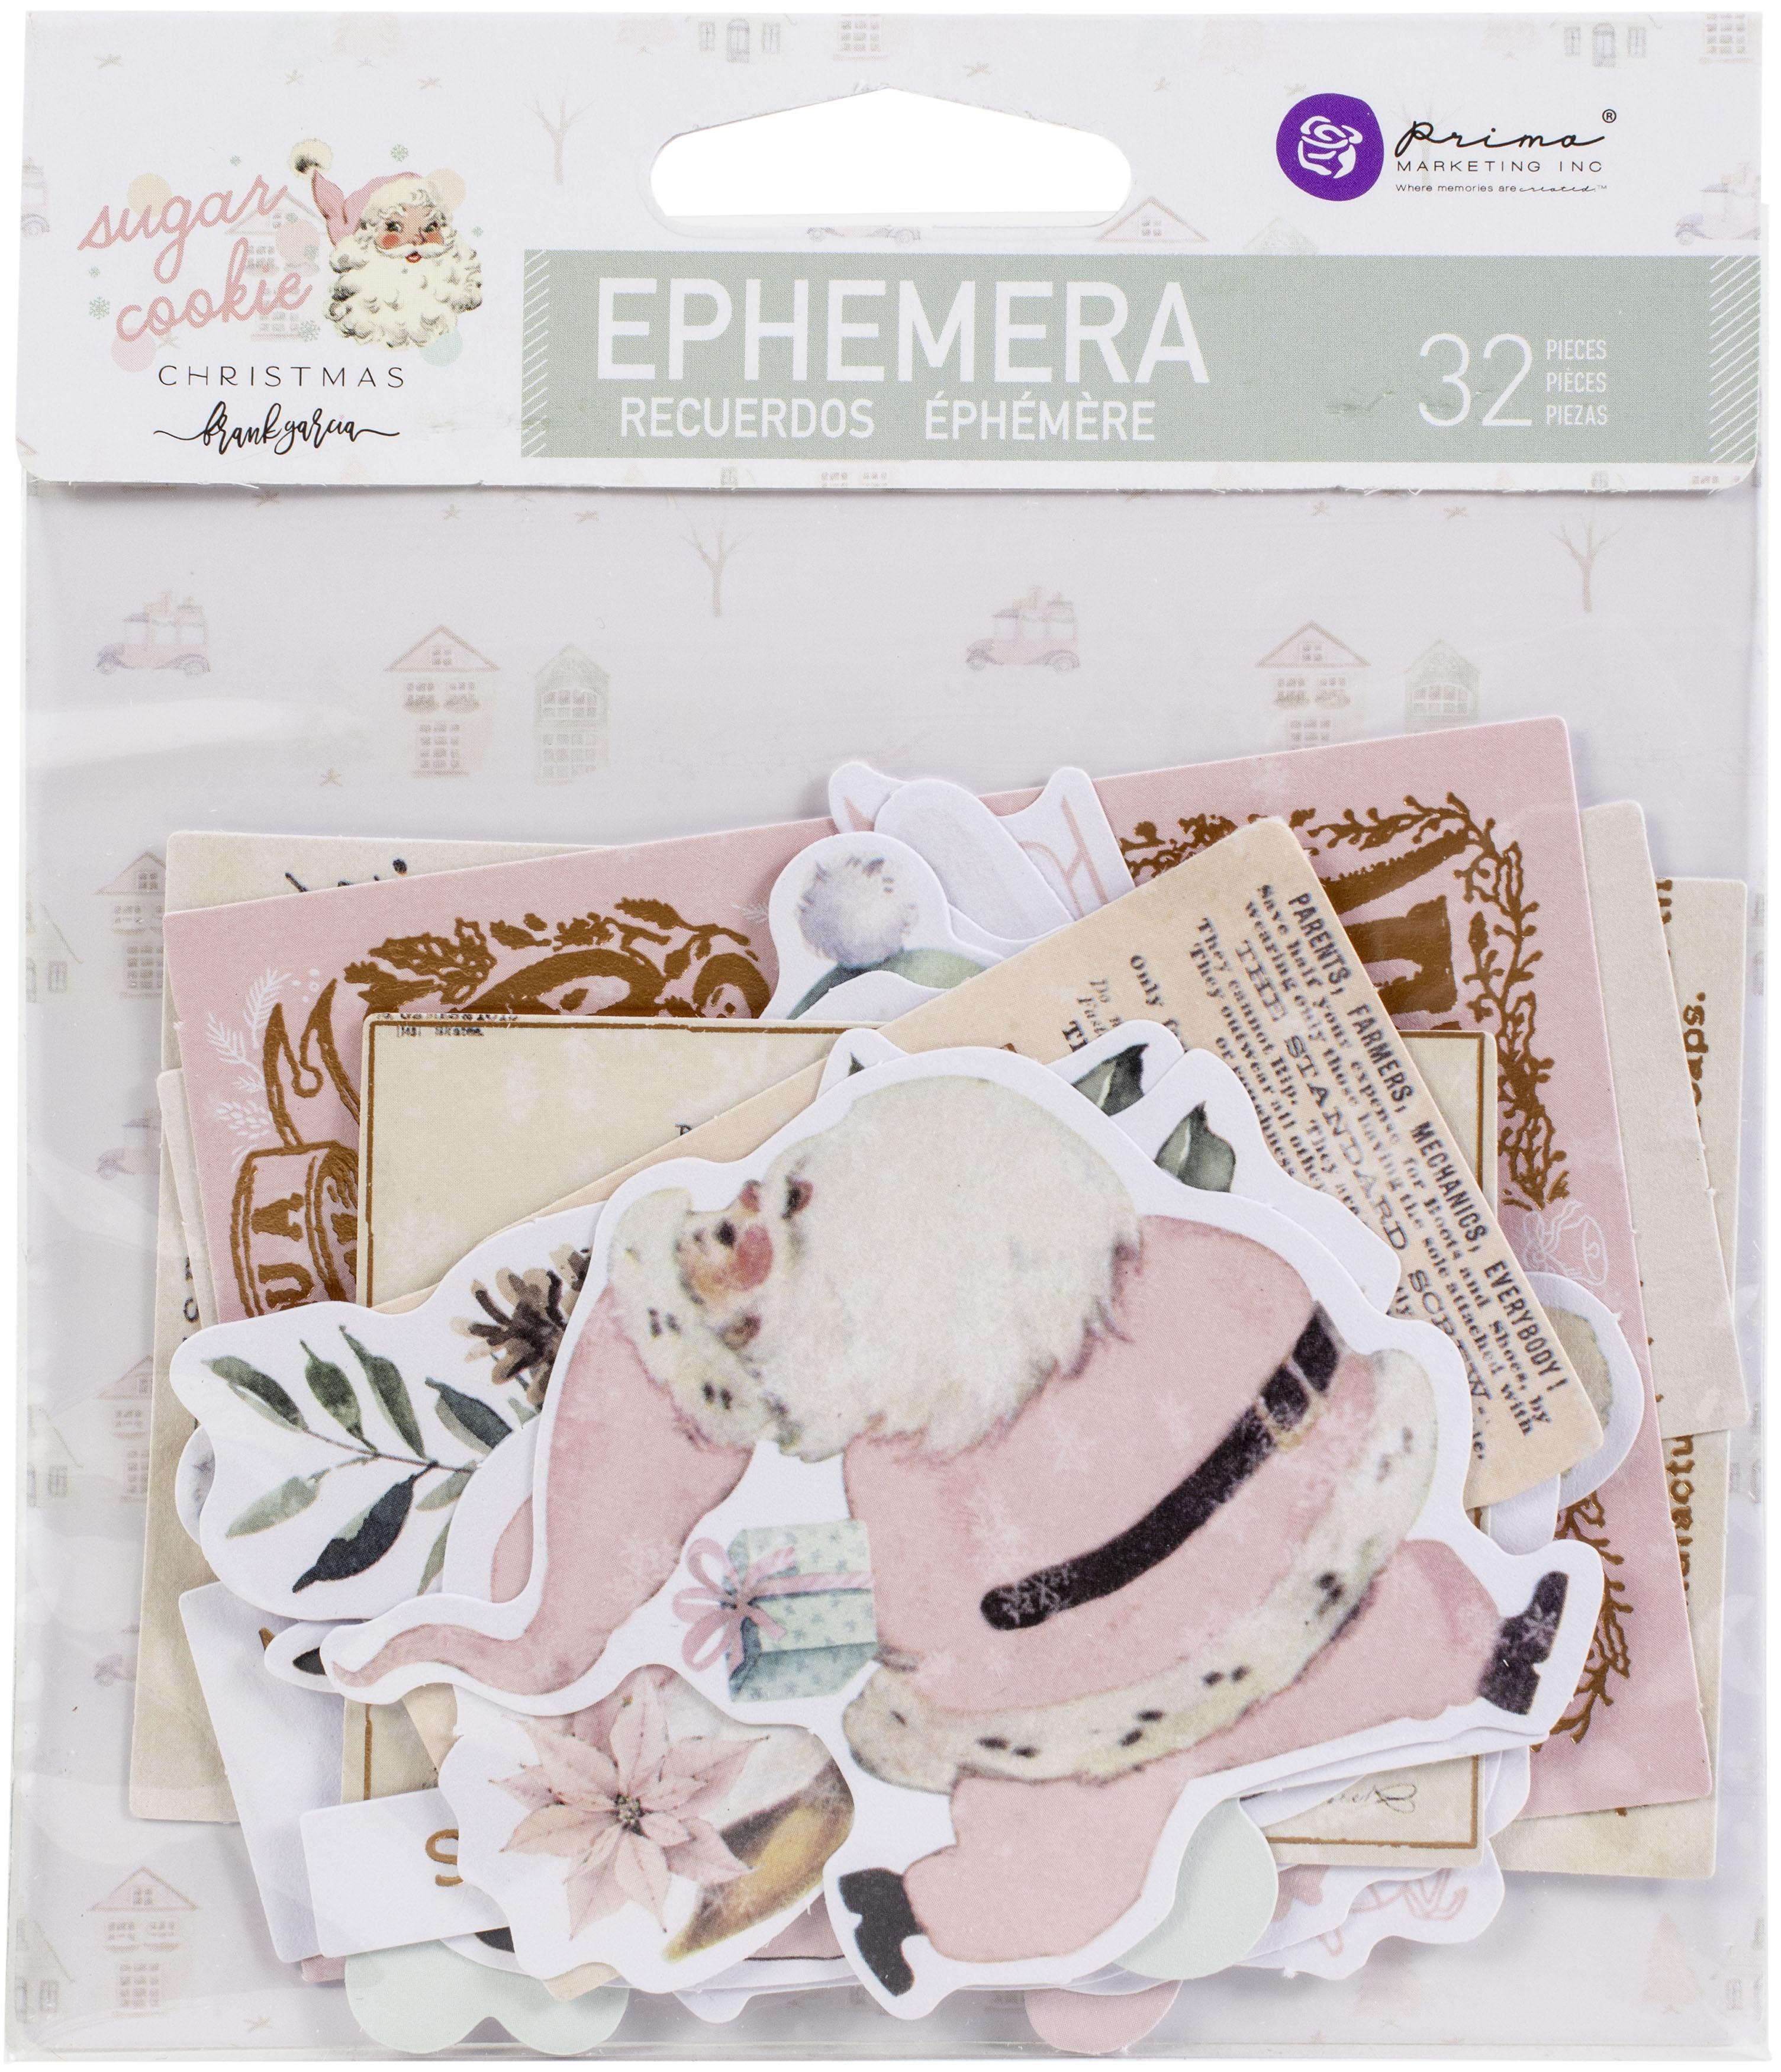 Sugar Cookie By Frank Garcia Cardstock Ephemera 32/Pkg-Shapes, Tags, Words, Foil...